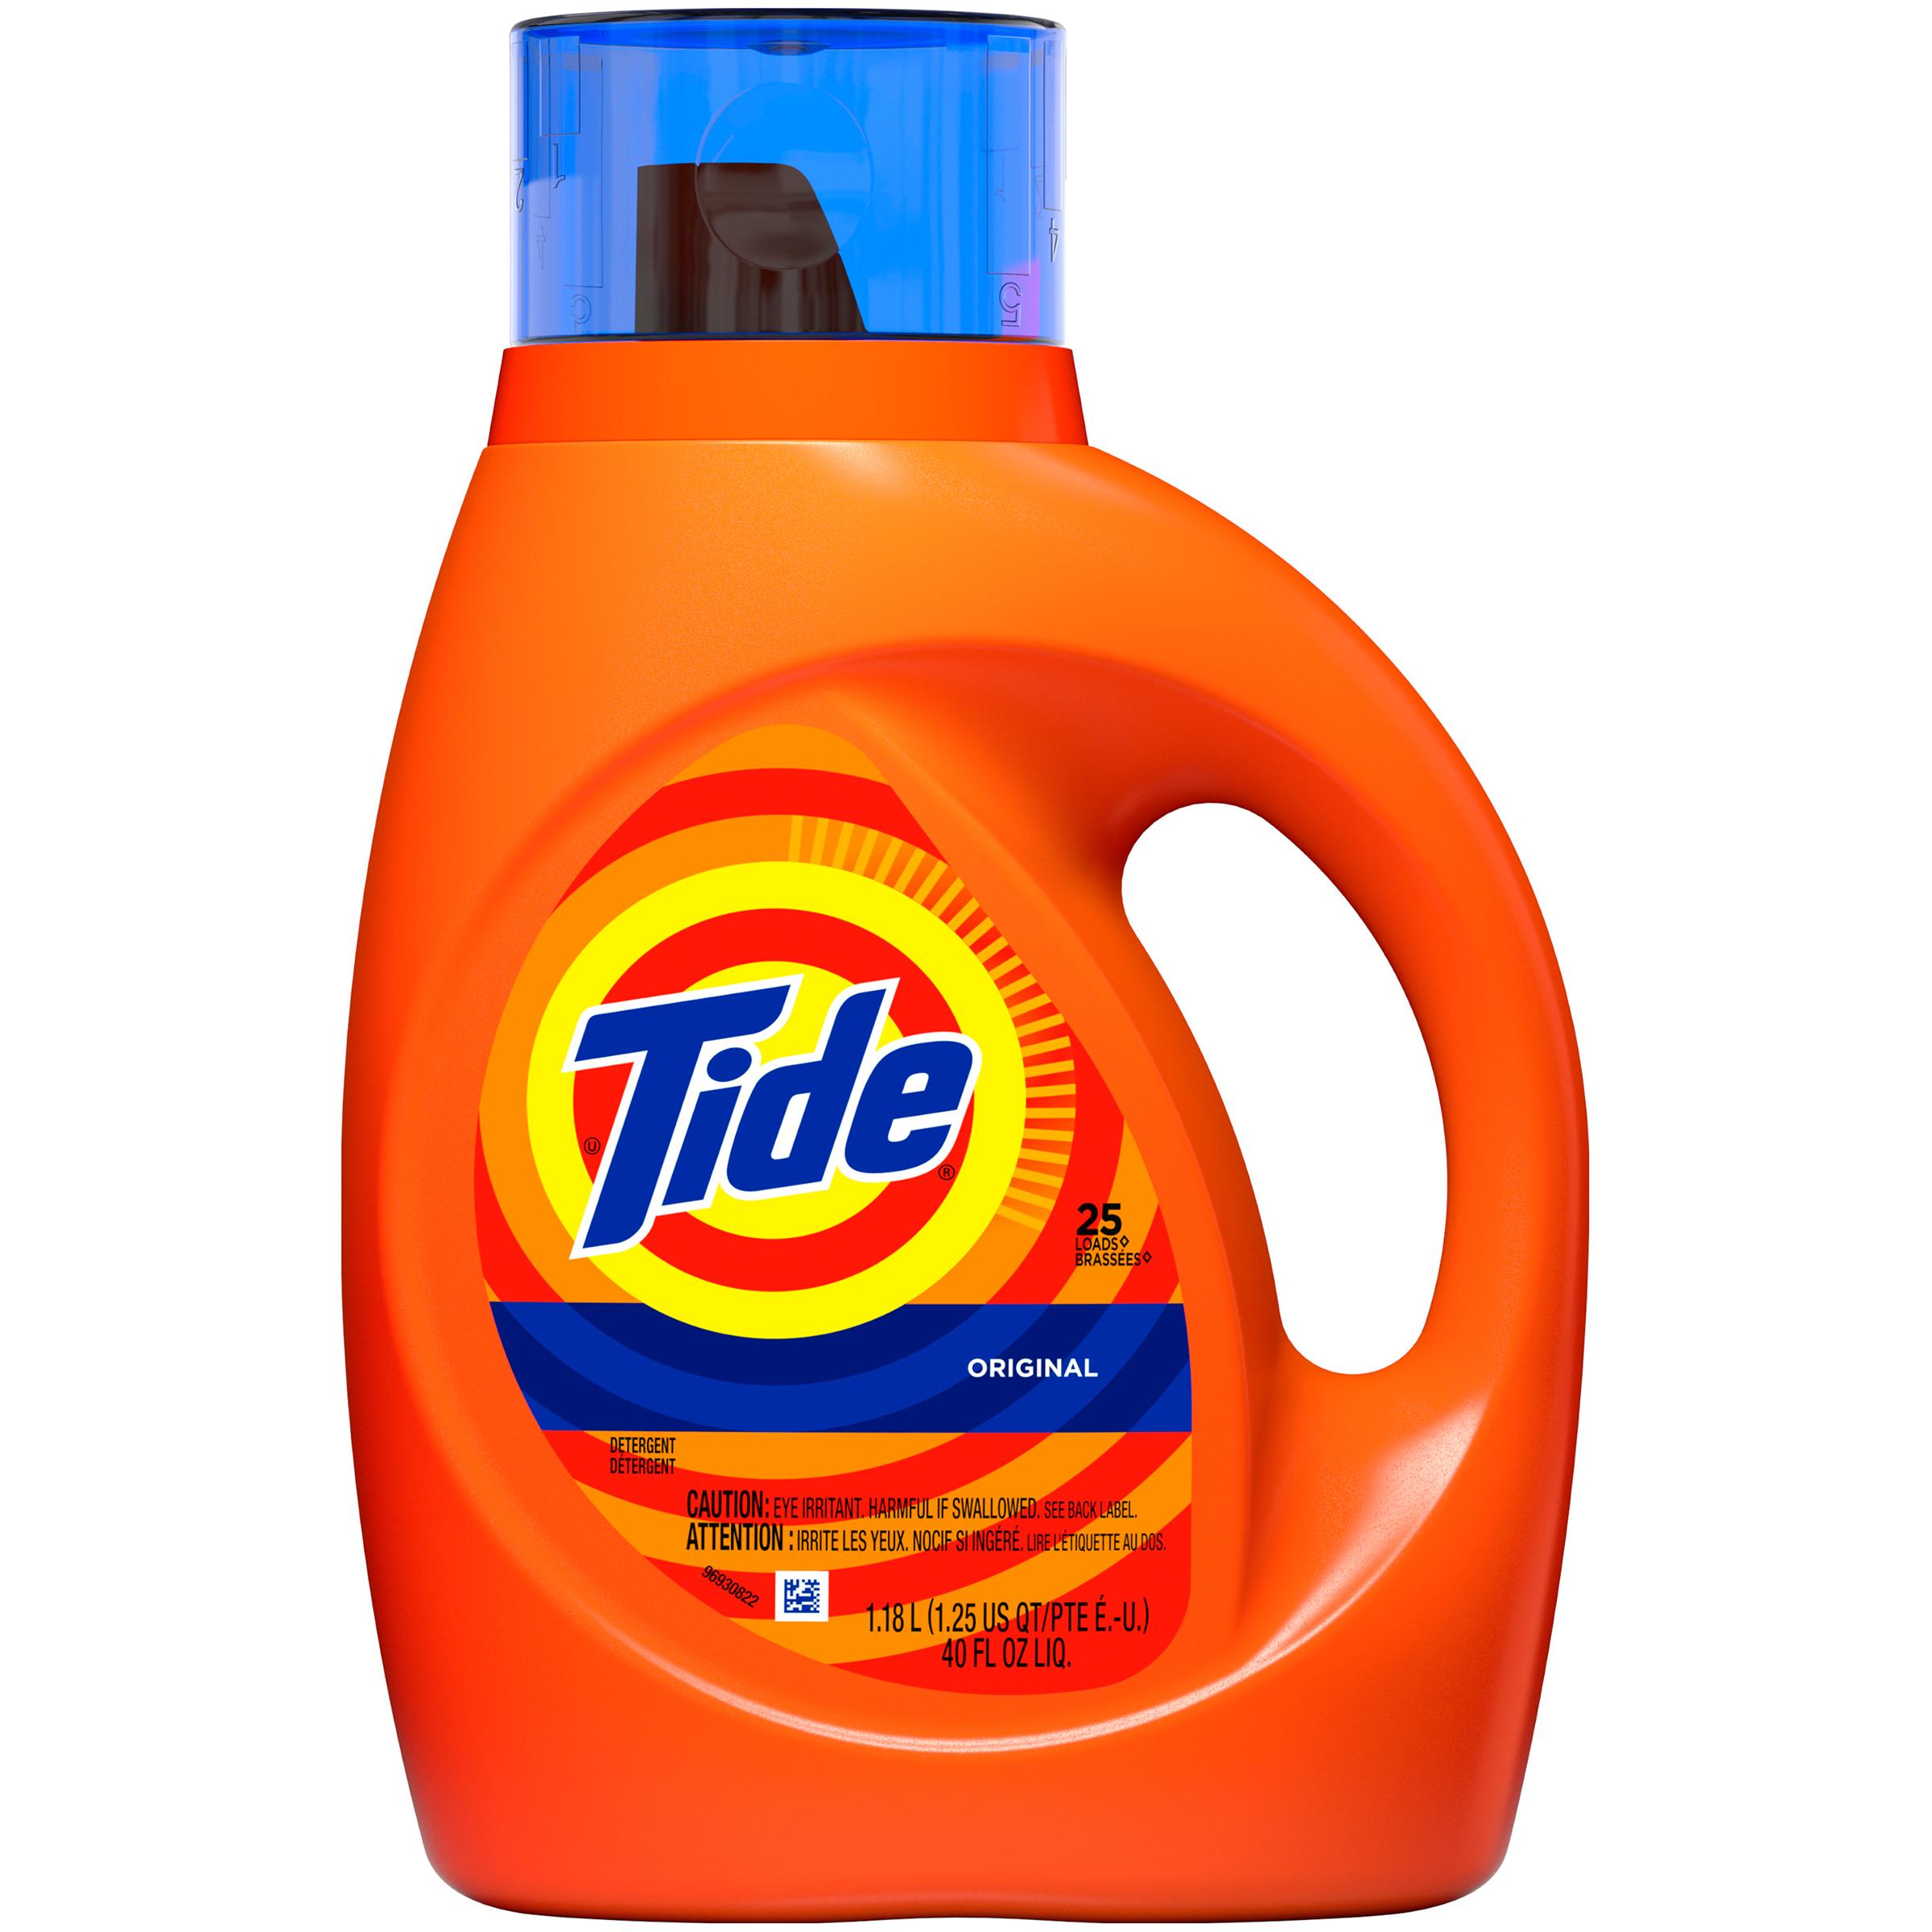 Tide Liquid Laundry Detergent 40 fl oz (1.18 L)